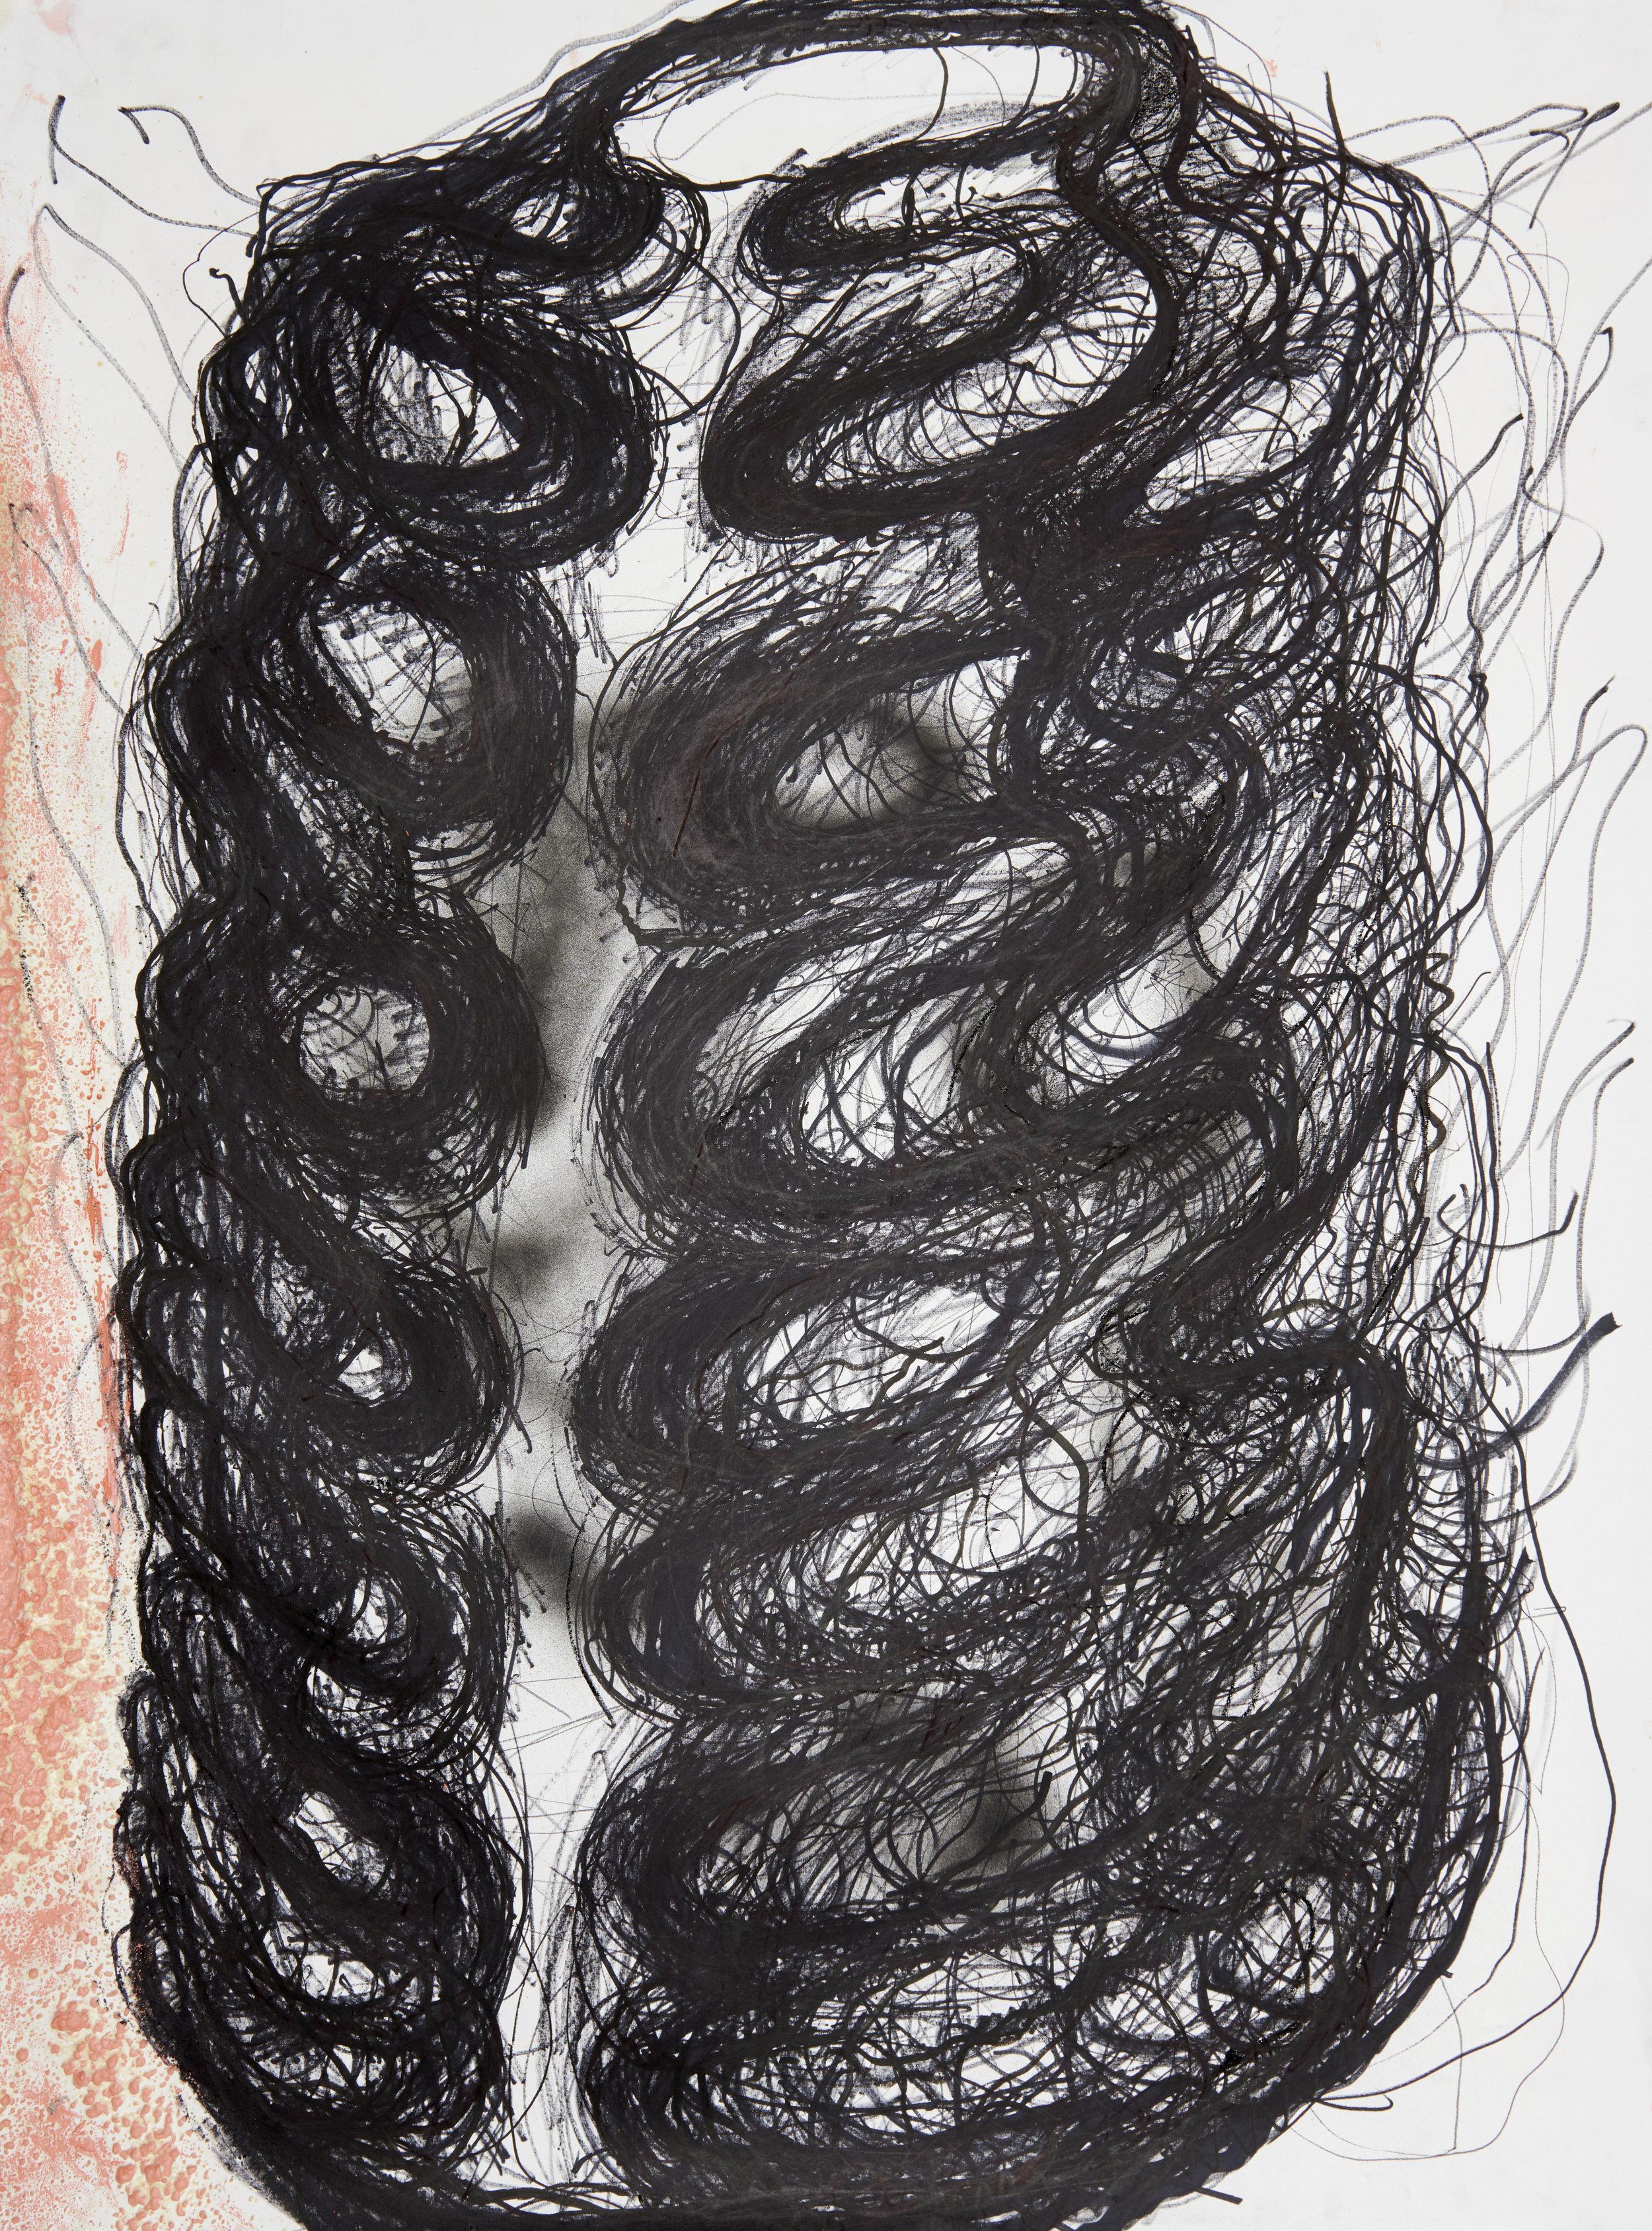 Spine study, 2018 135 x 100 cm Marker, ink, acrylic spary, gesso, polyurethane foam on paper